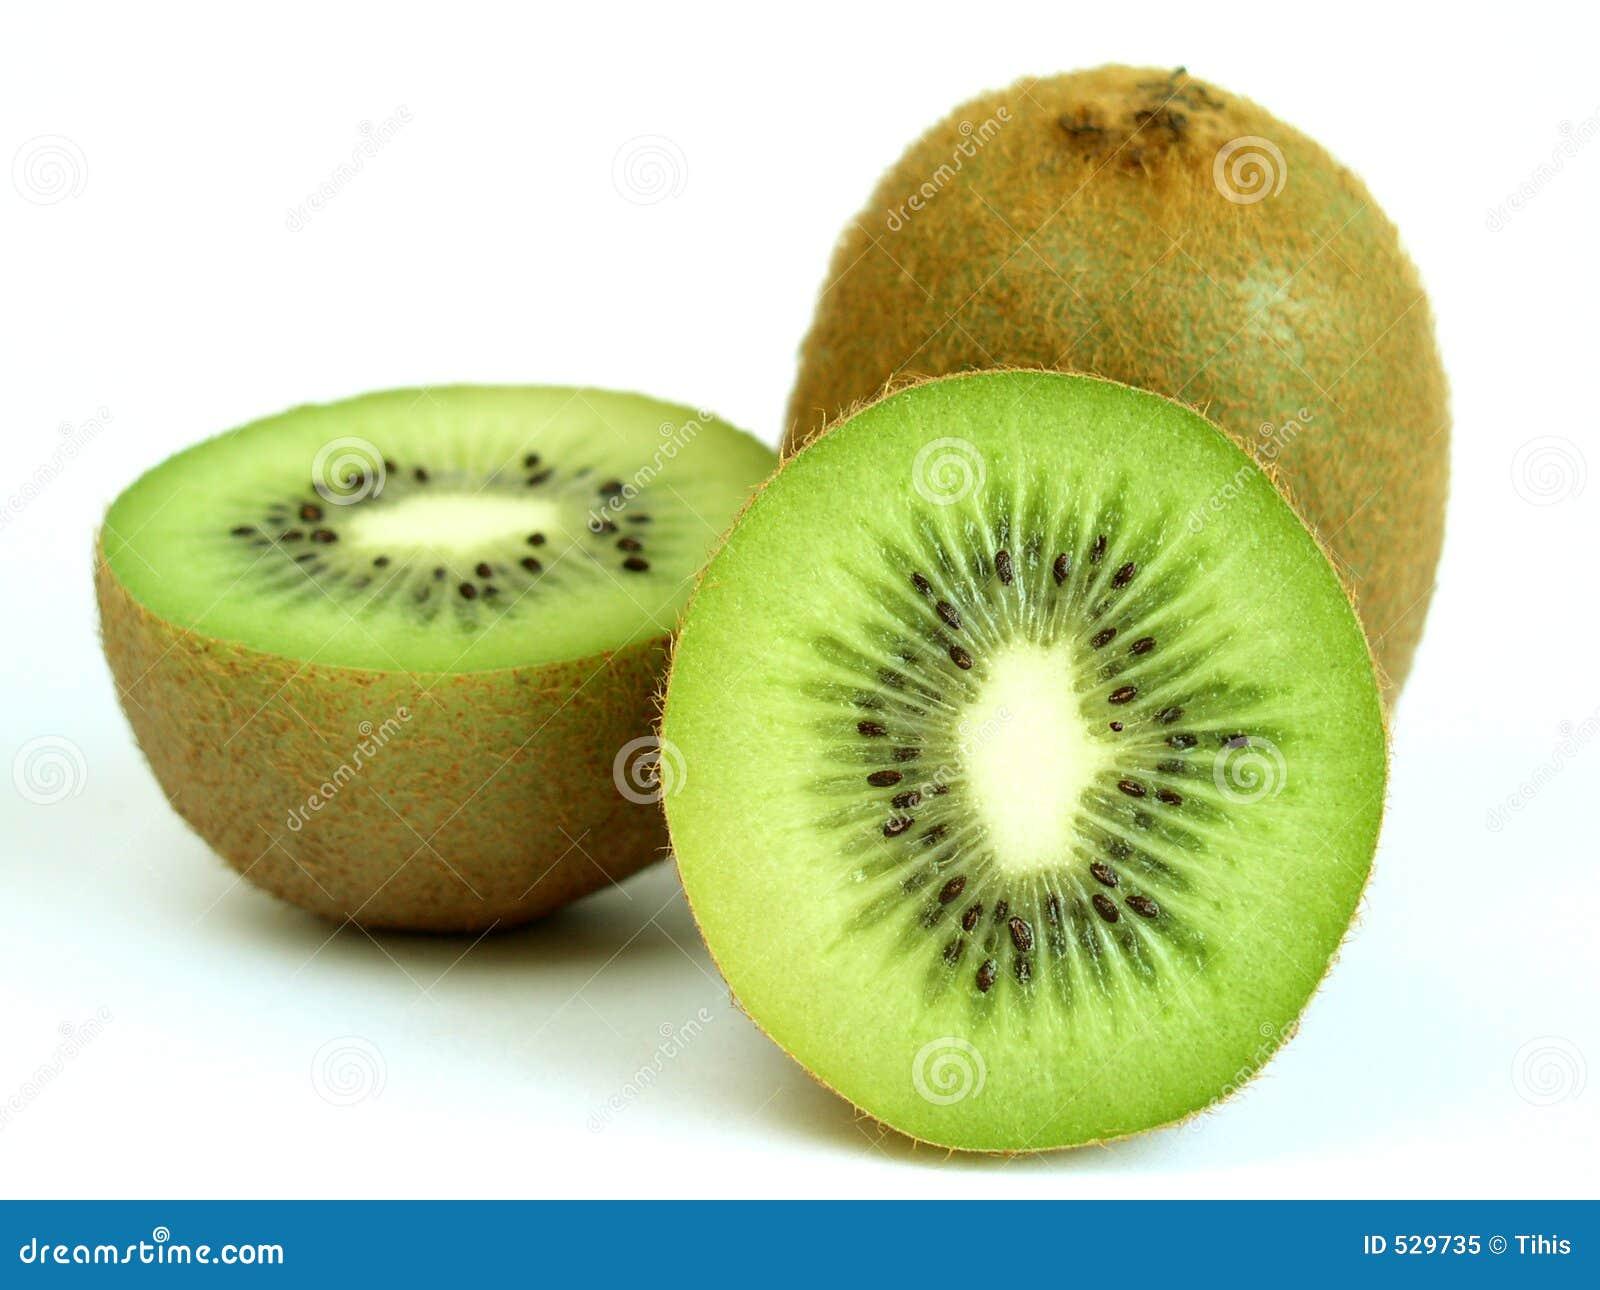 Download 猕猴桃 库存图片. 图片 包括有 果子, 食物, browne, 特写镜头, 鲜美, 维生素, 猕猴桃, 产物 - 529735